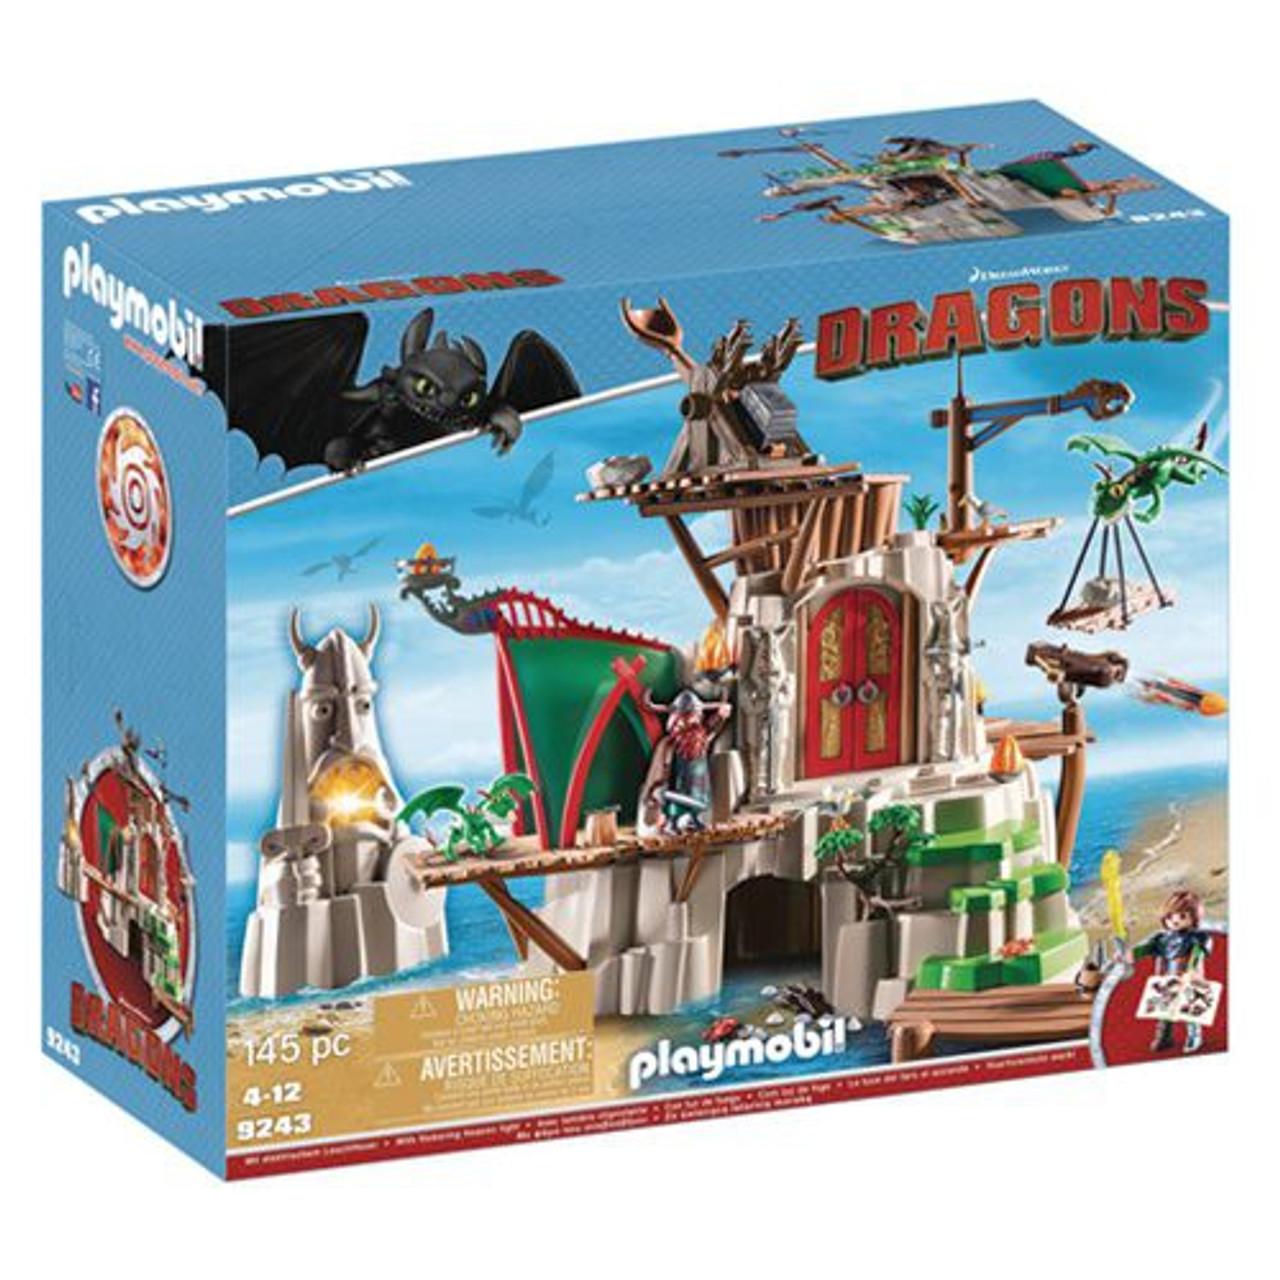 Playmobil Dragons Dragon Figurines Dragons Viking